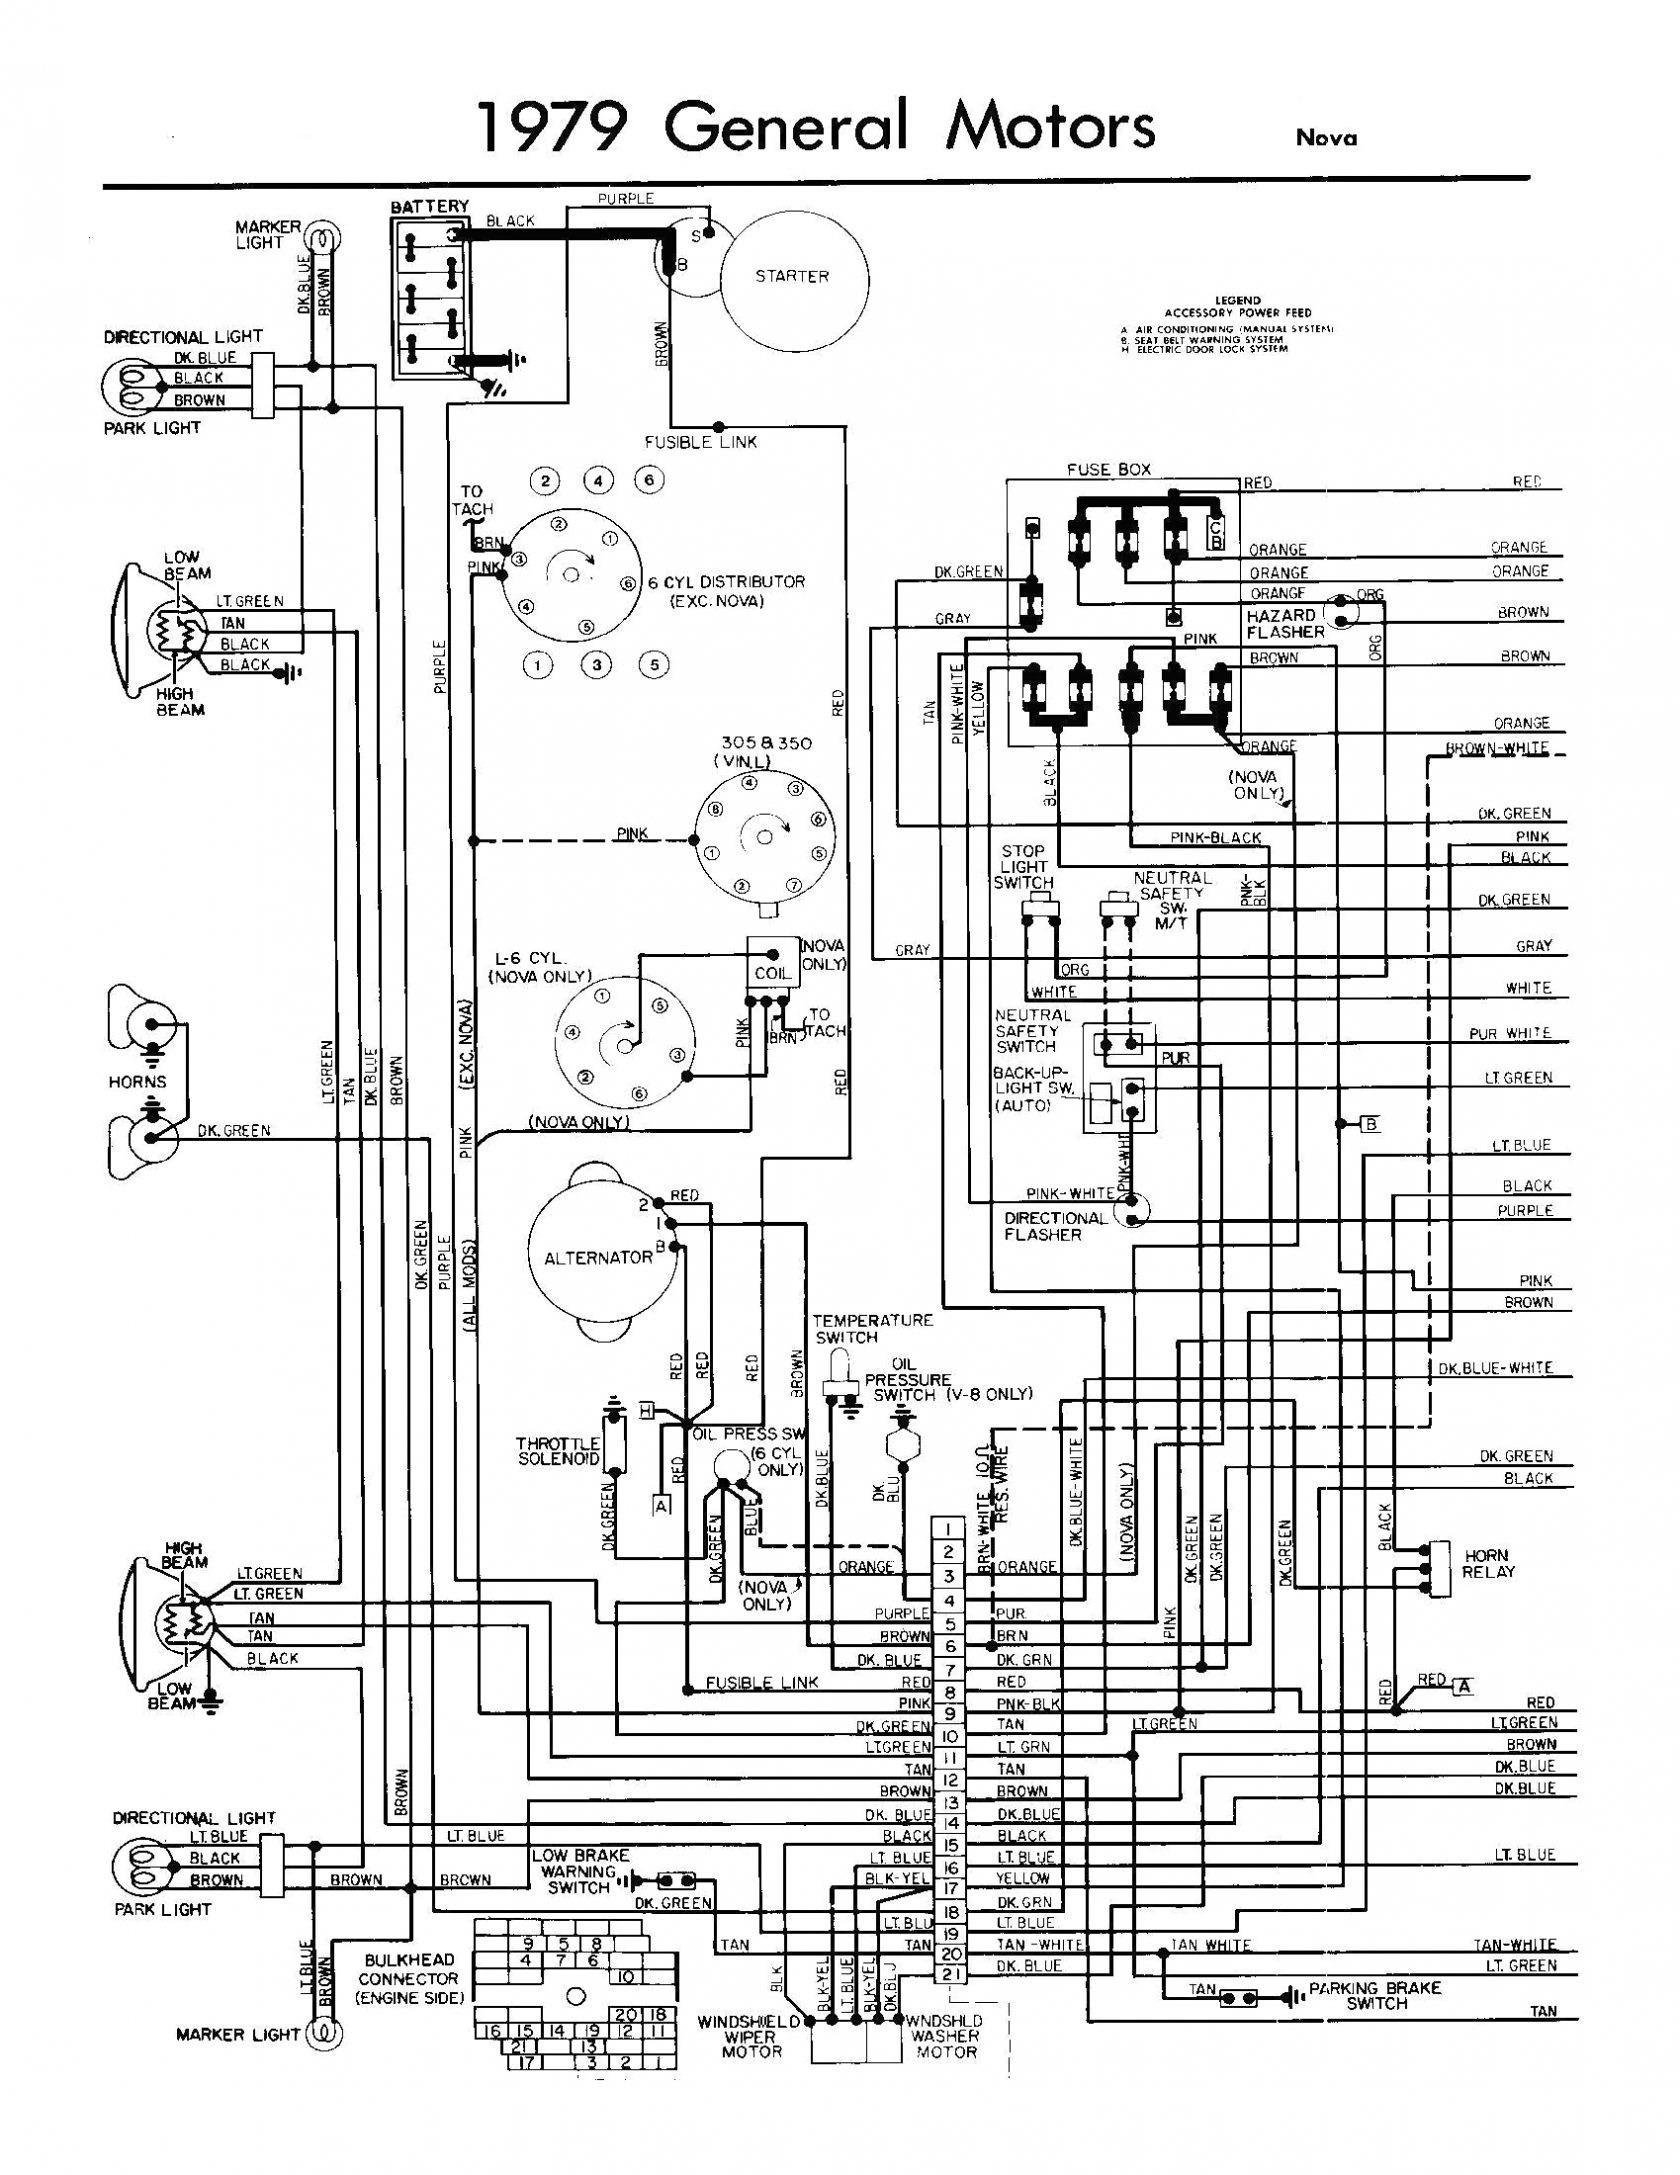 1991 chevy caprice wiring diagram xv 1149  chevrolet beat fuse box schematic wiring  chevrolet beat fuse box schematic wiring